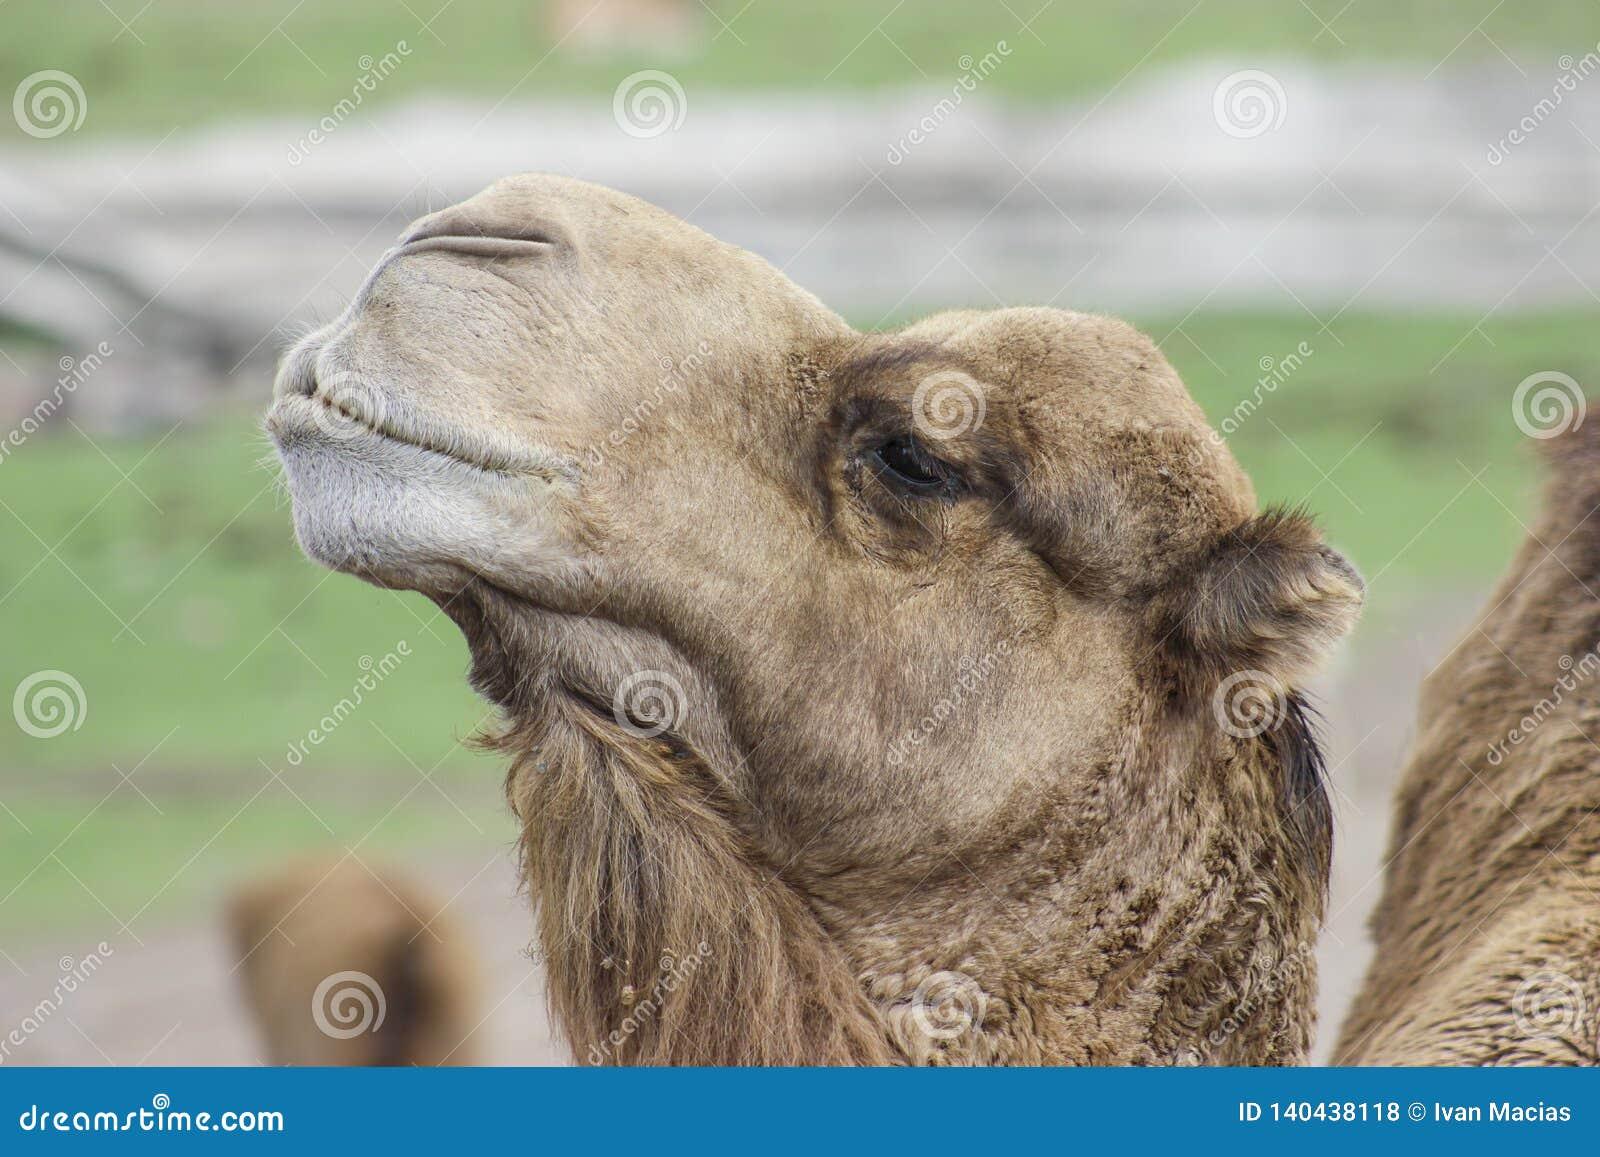 CAMEL ANIMAL NATURE CAMELLO SELVA